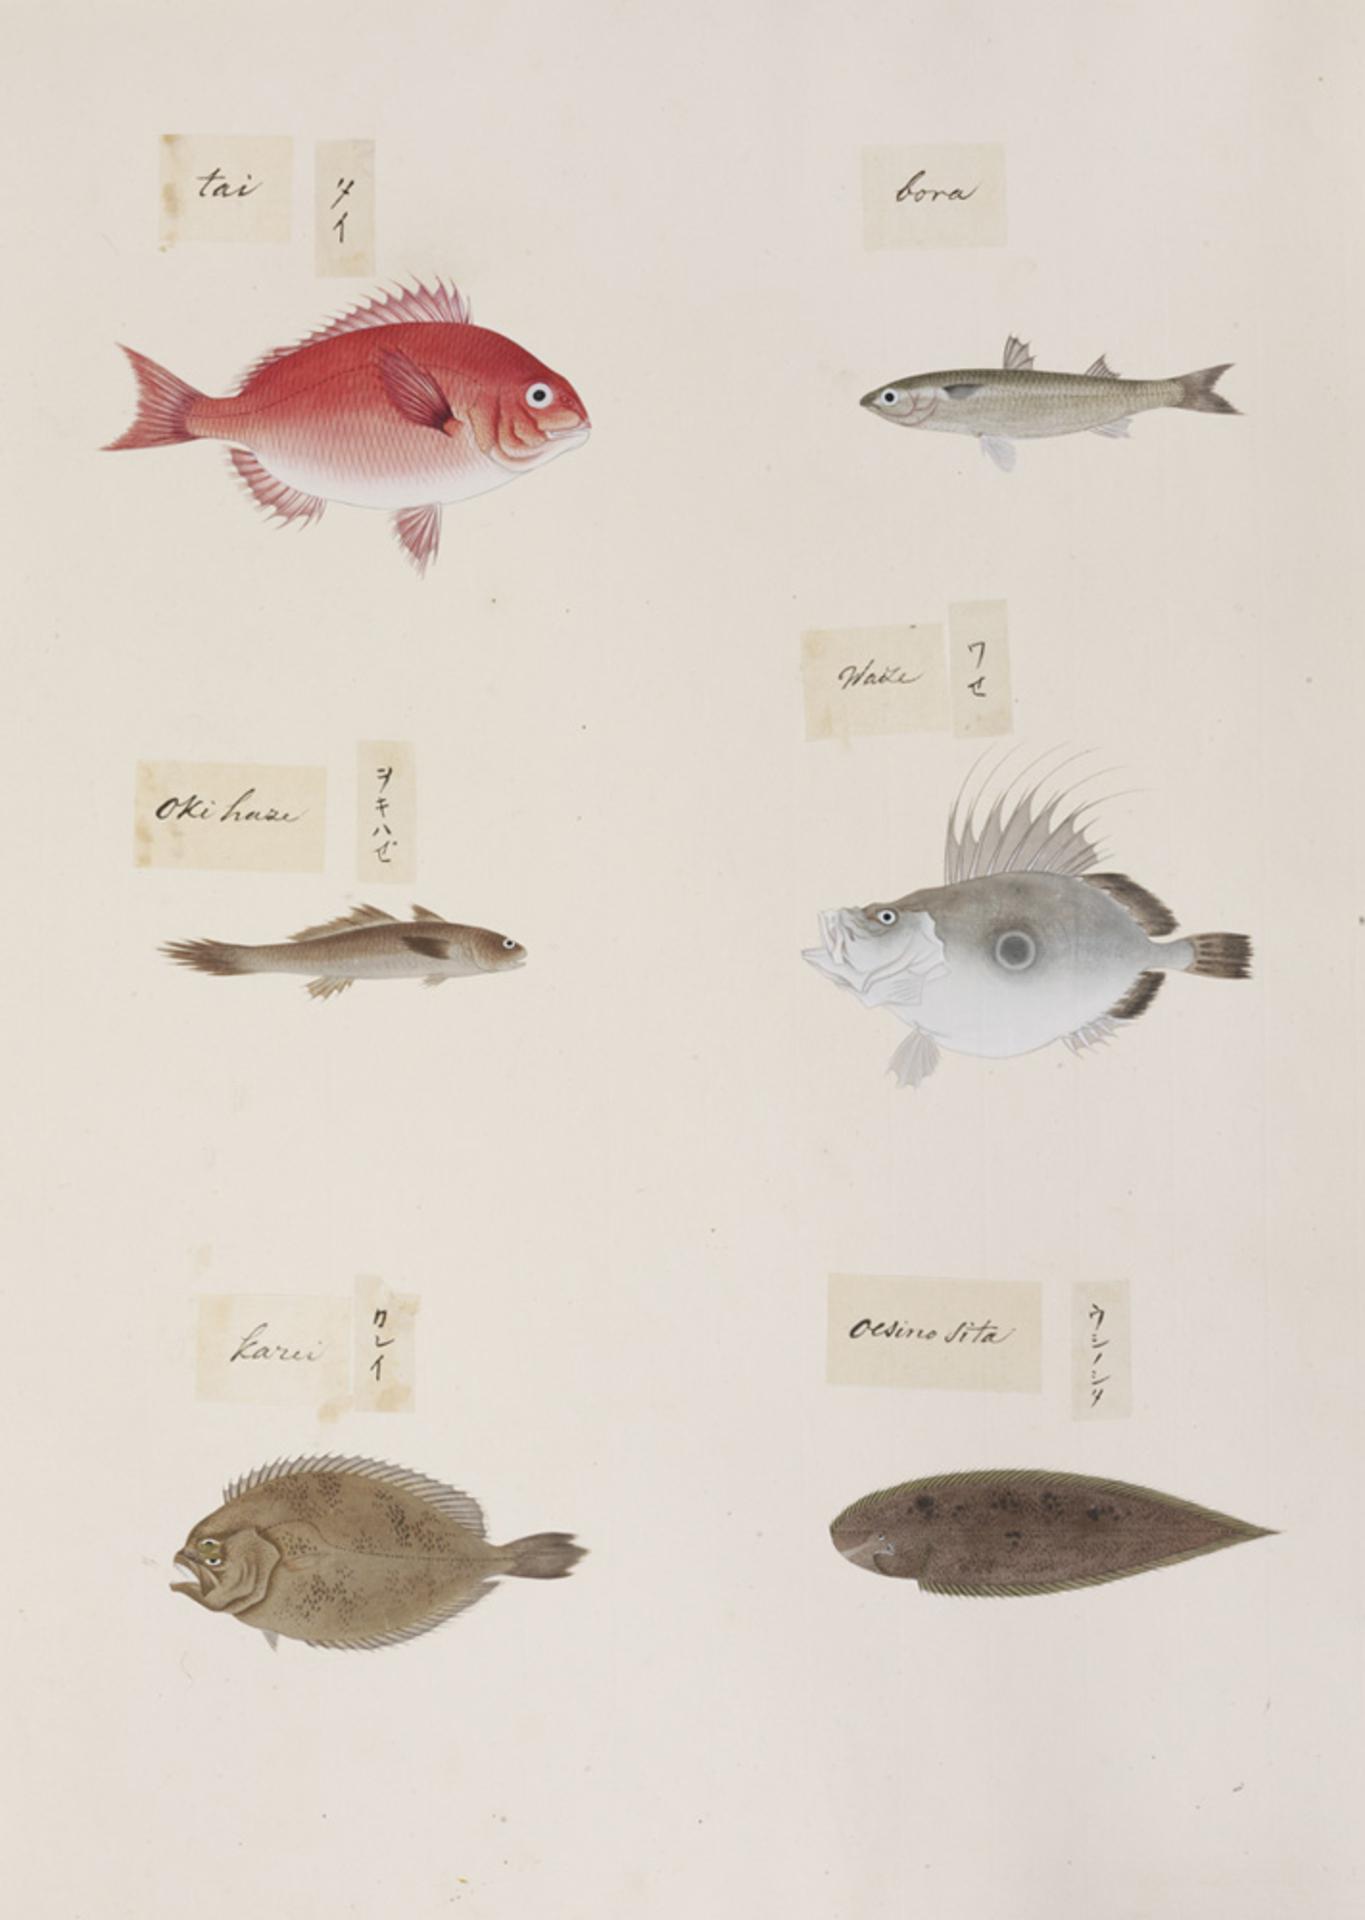 RMNH.ART.317 | Paralichthys olivaceus